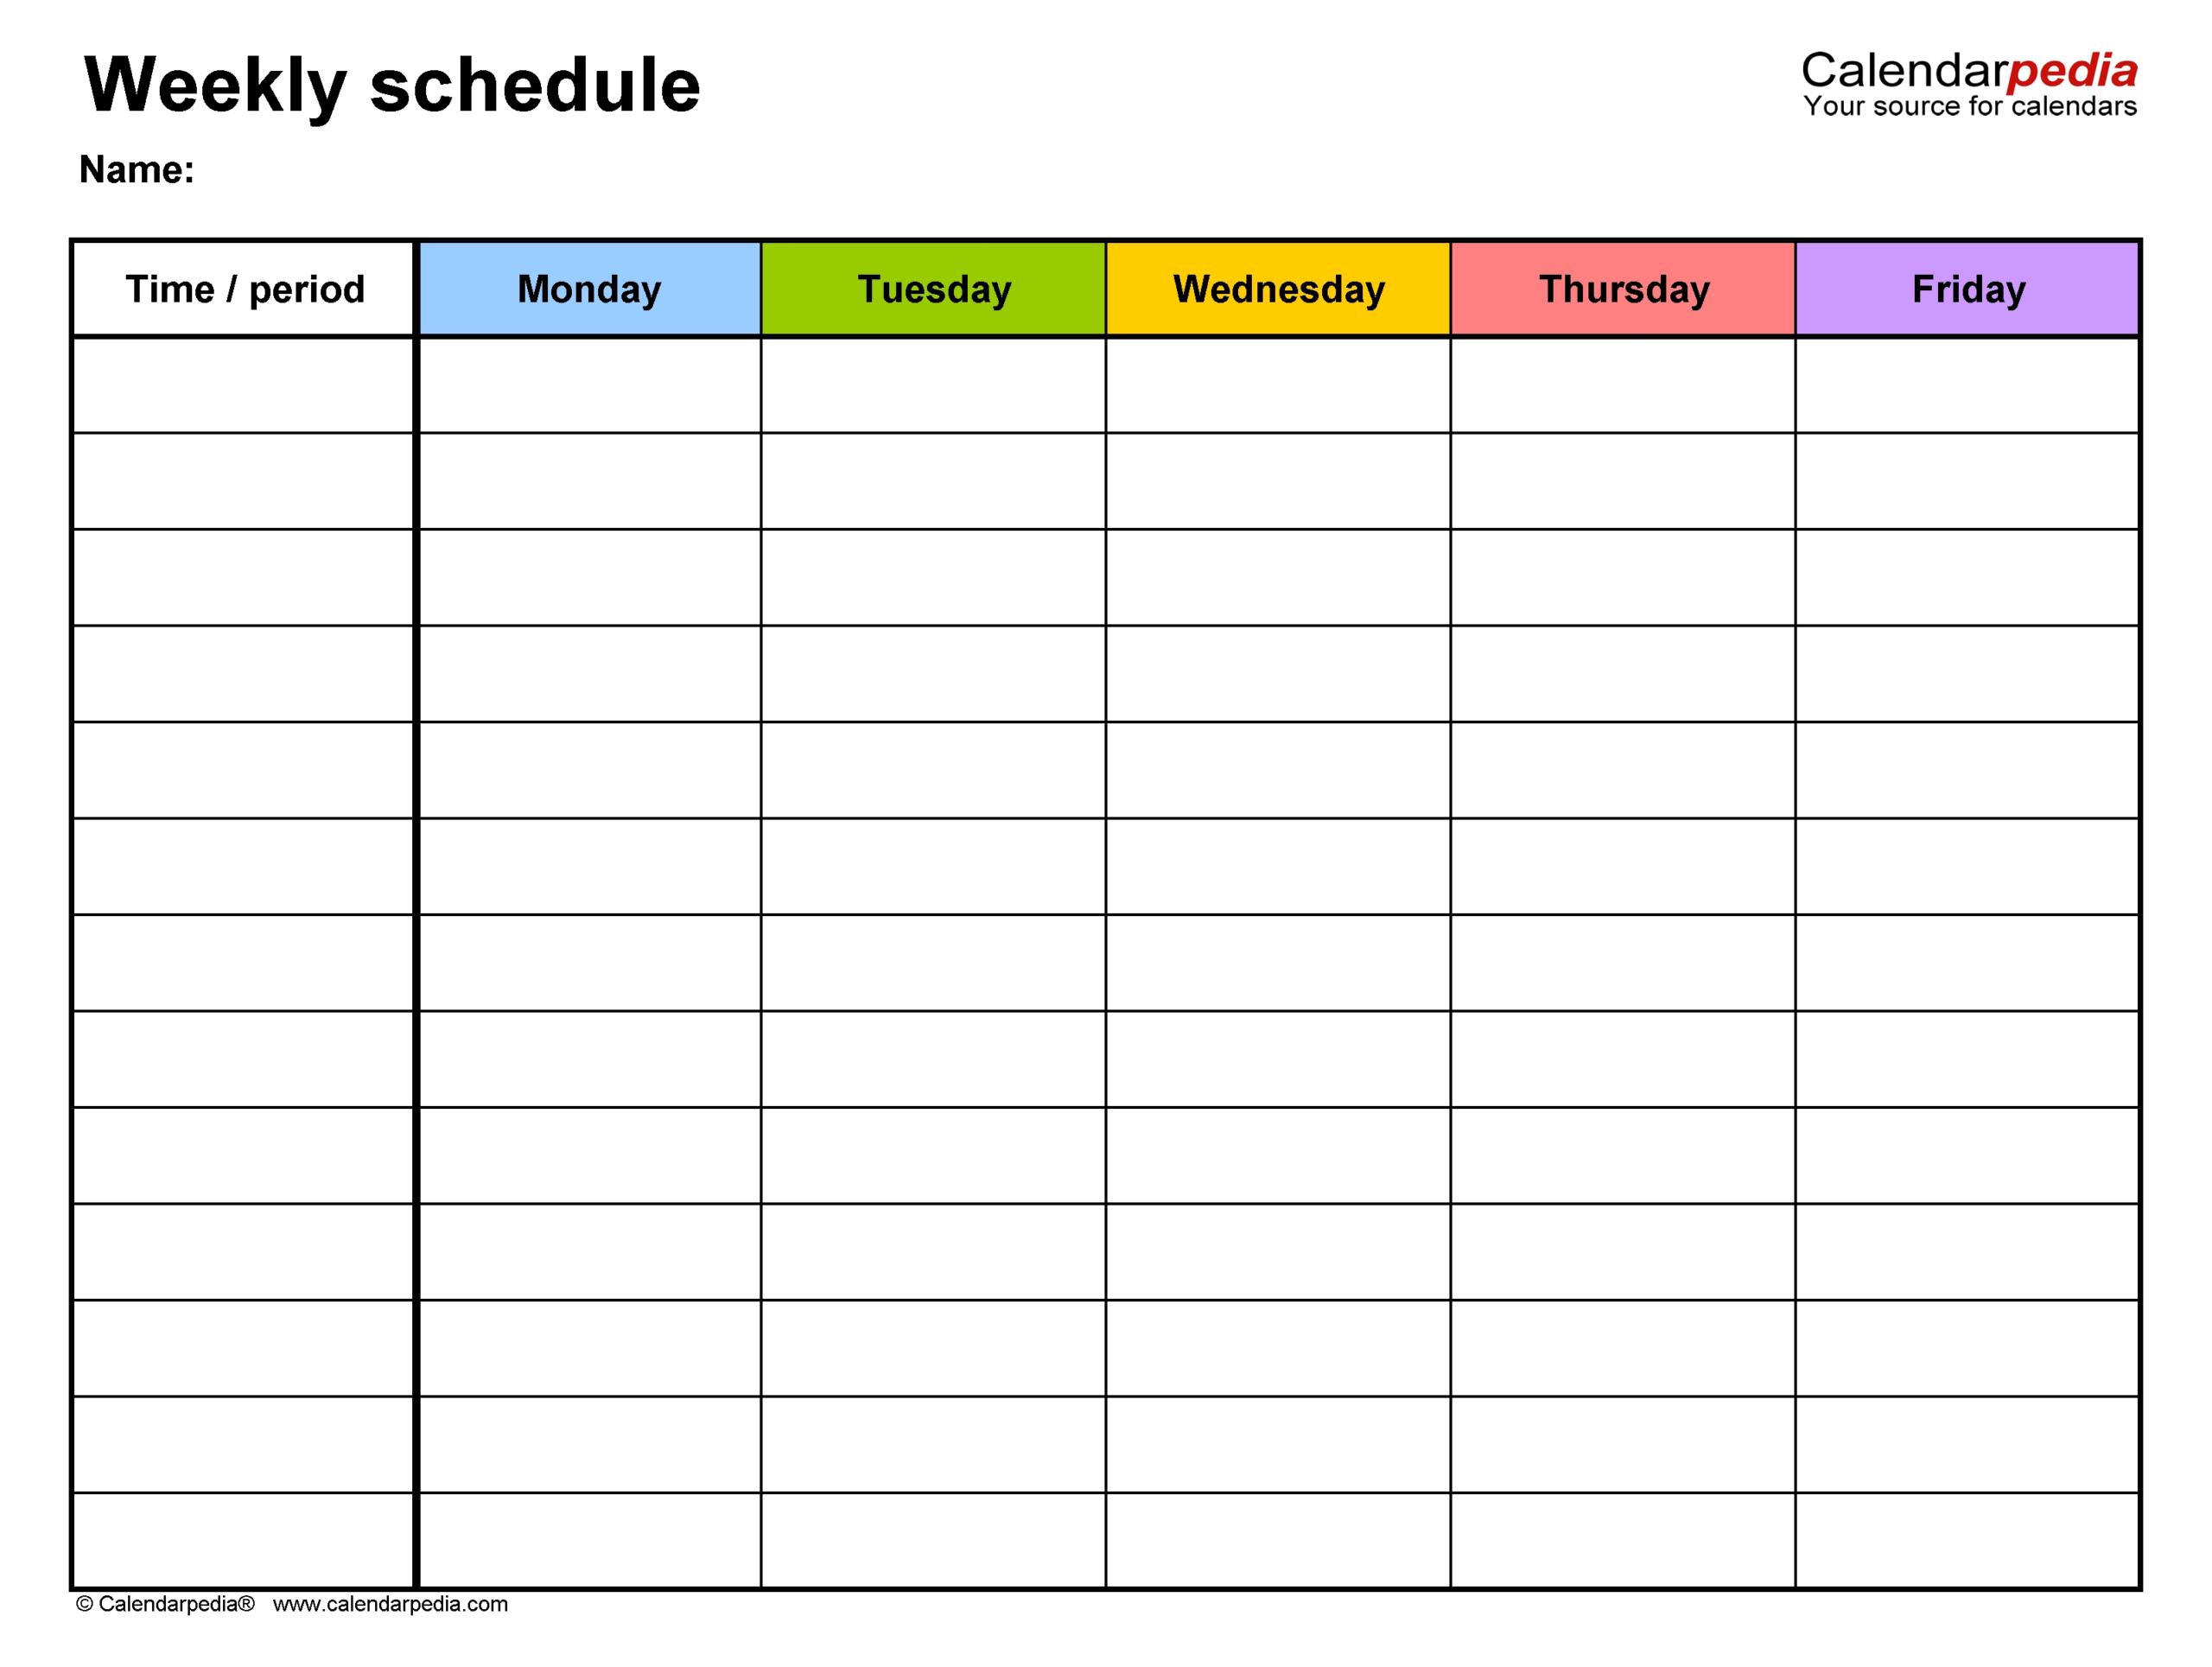 5 Day Week Calender Template | Calendar Template Printable